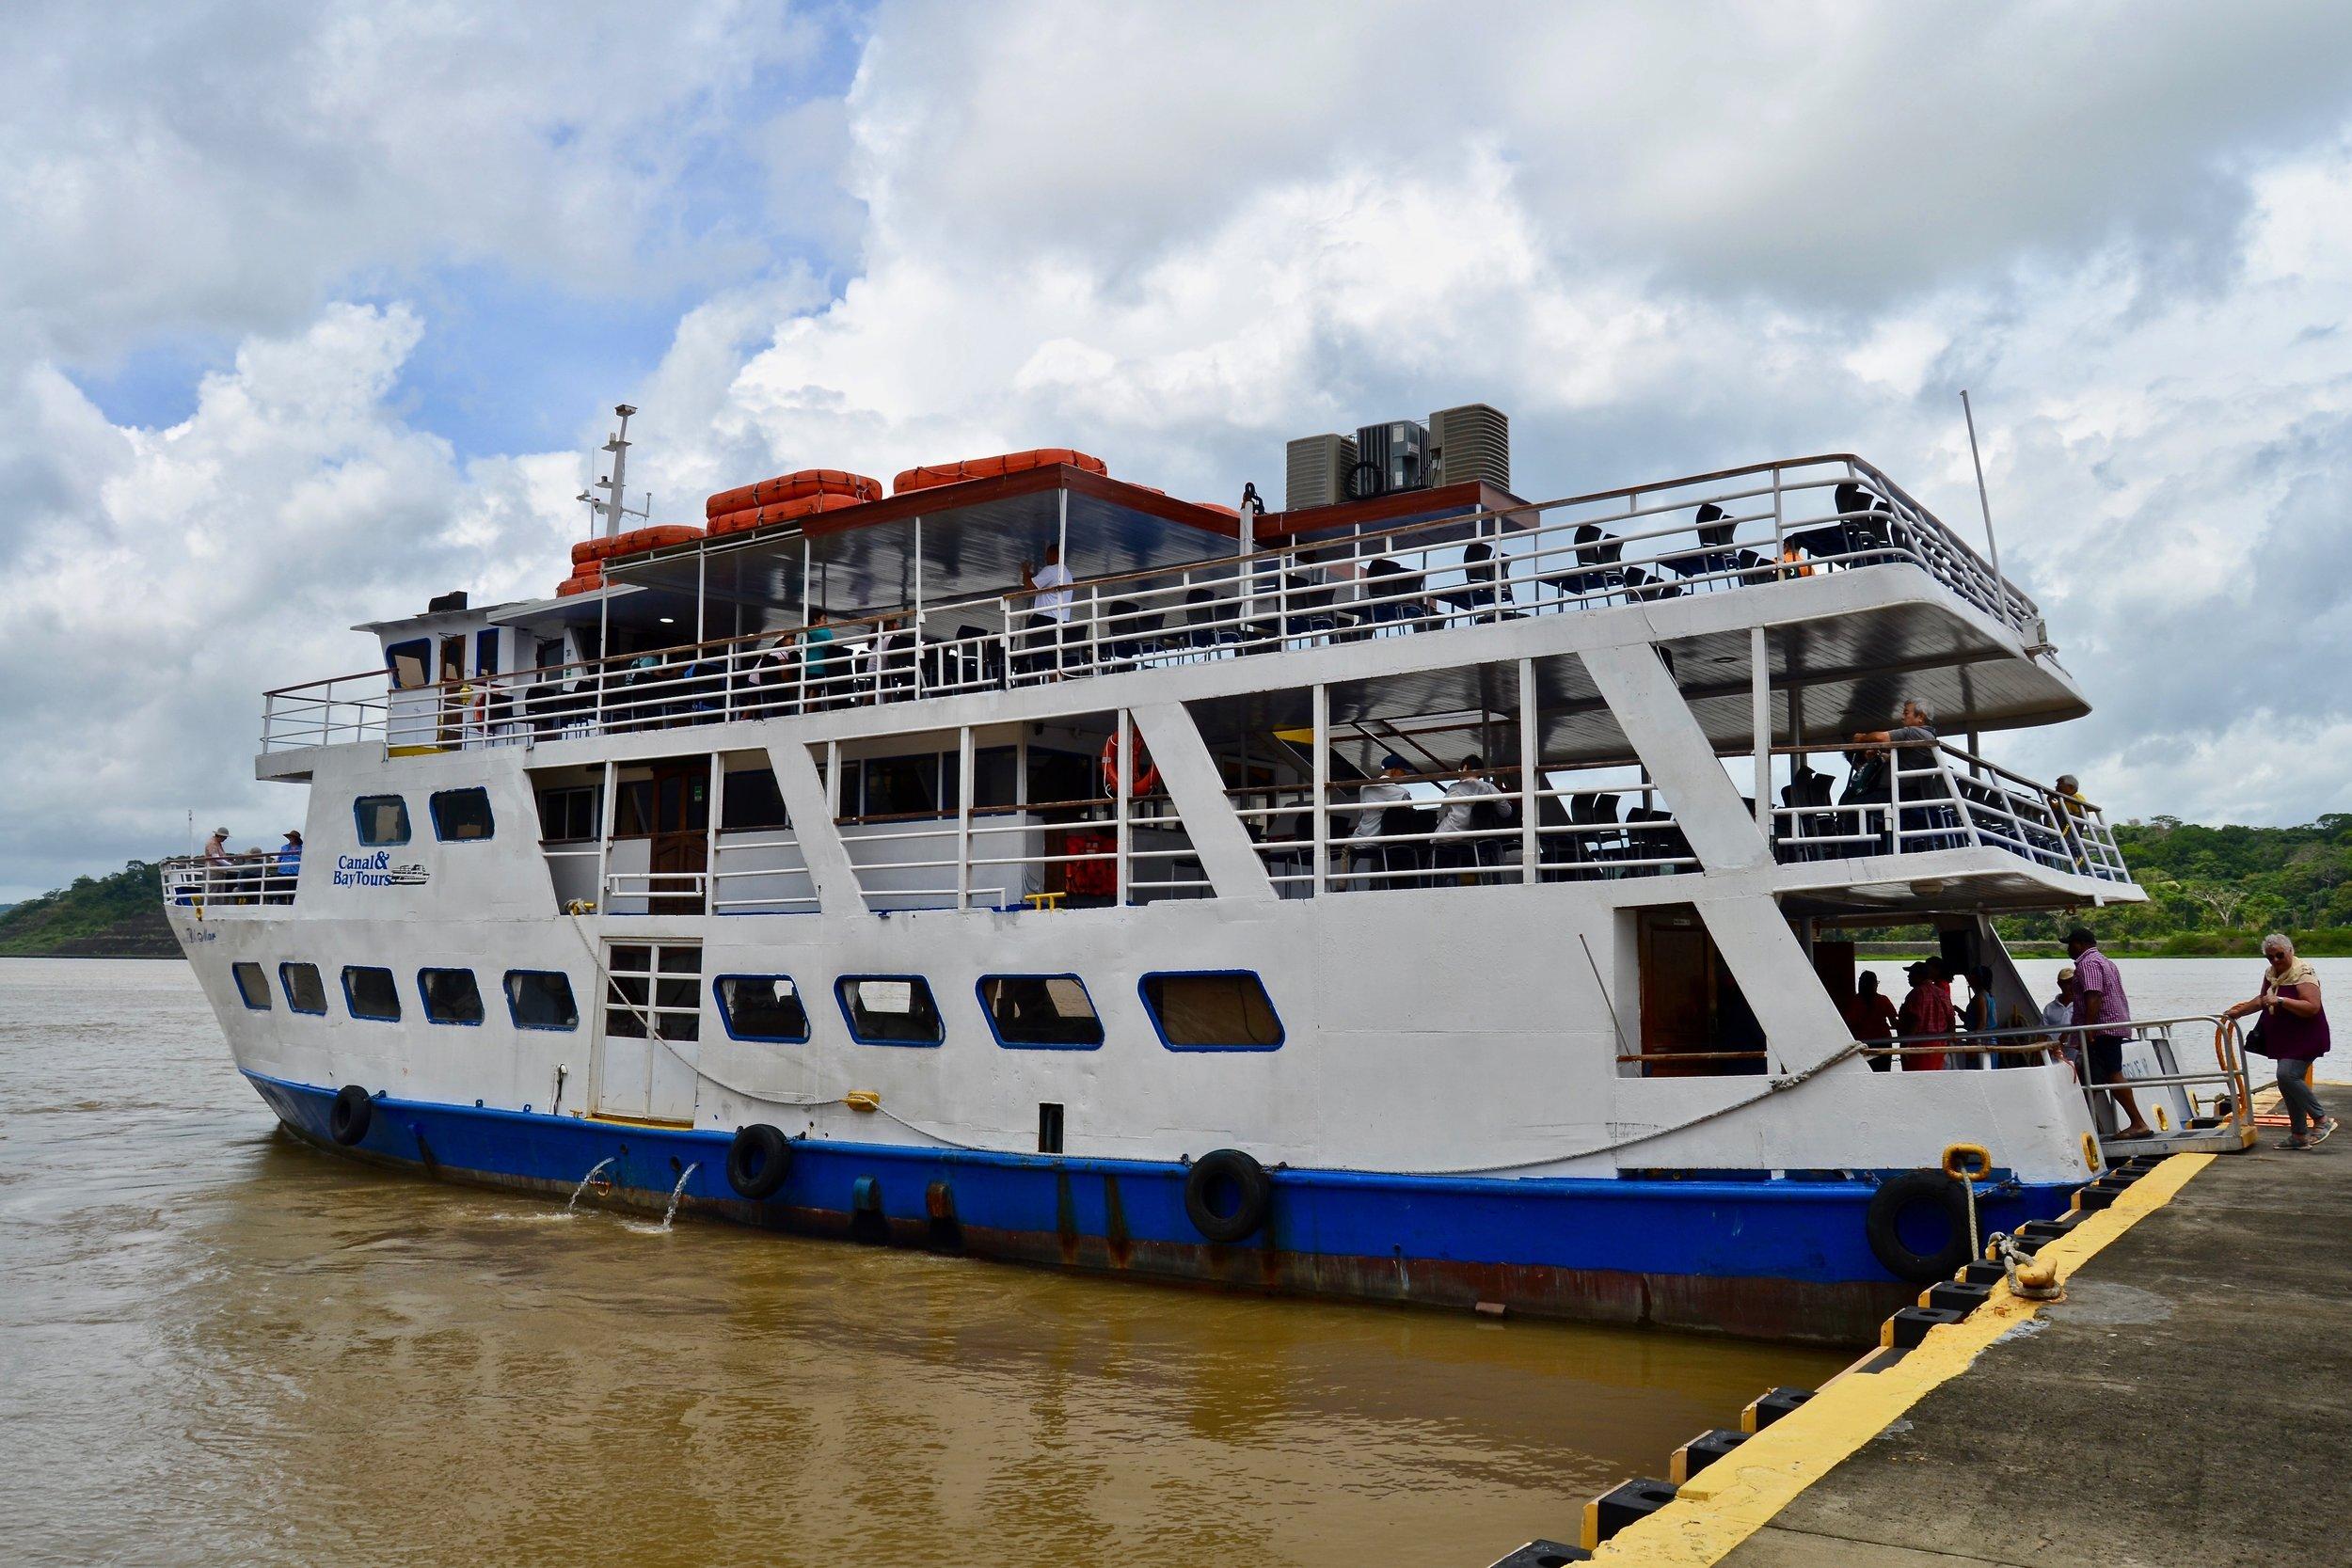 The Panama Canal Tour Ship